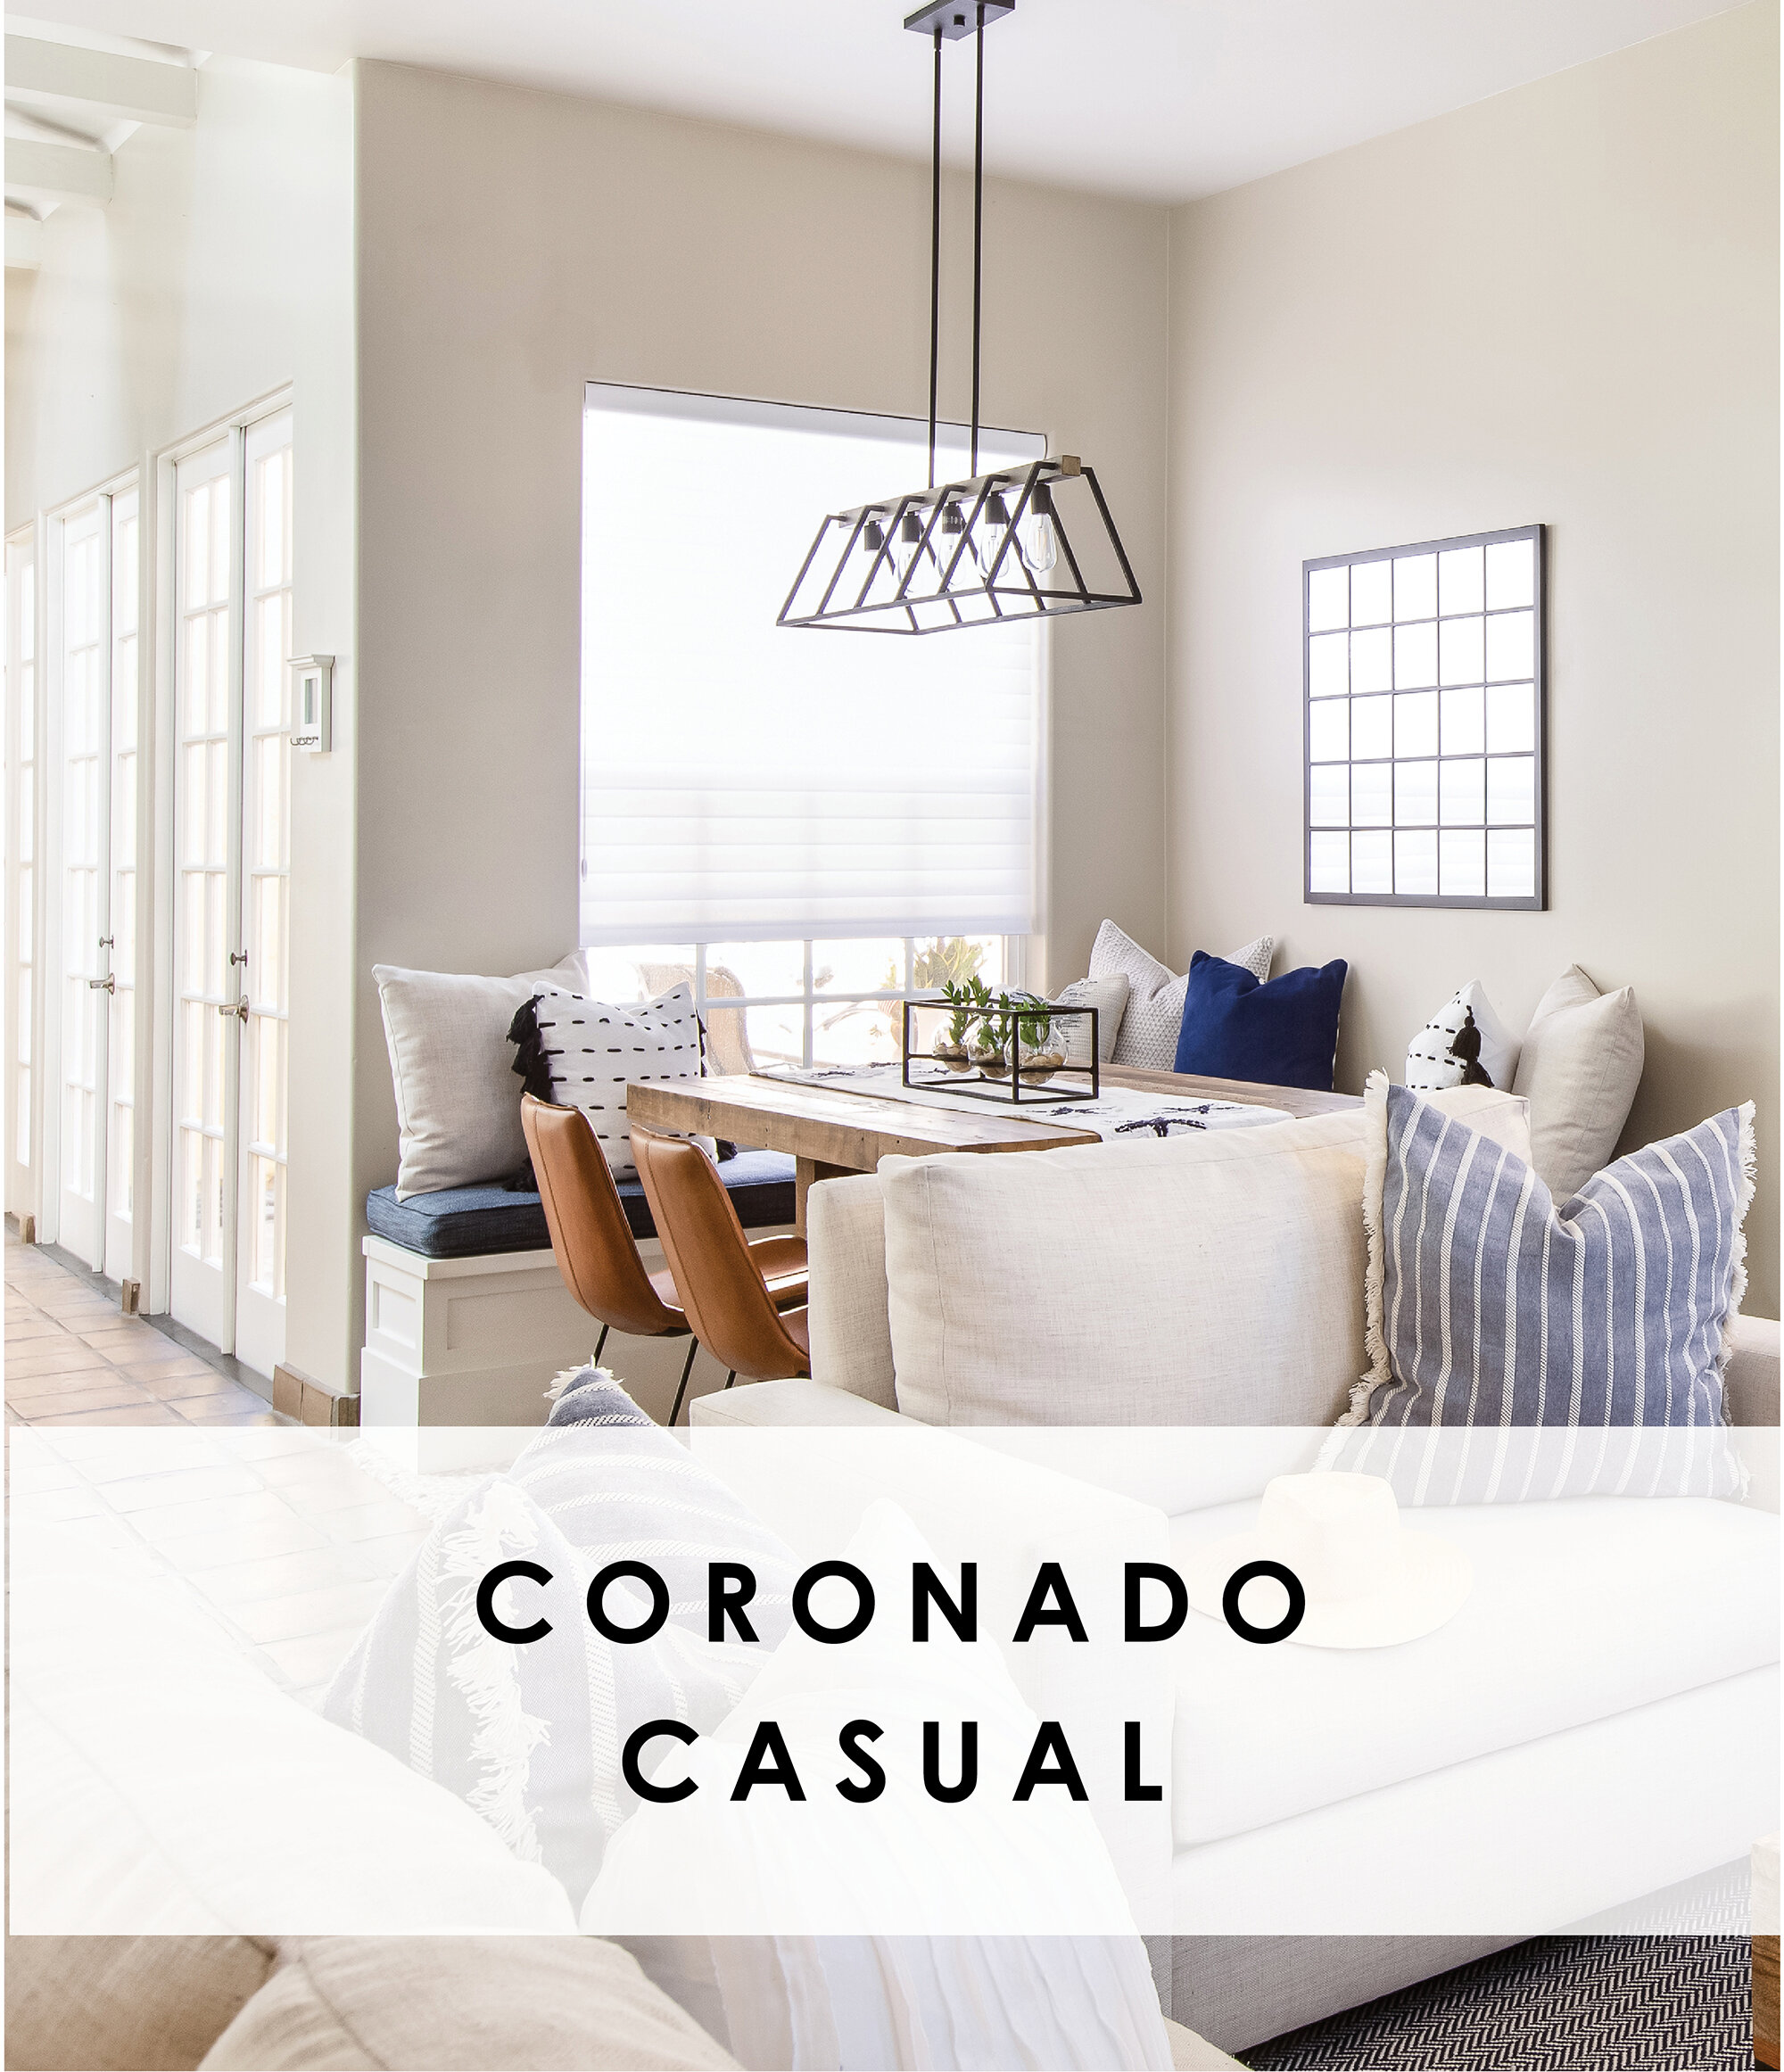 Coronado Casual.jpg